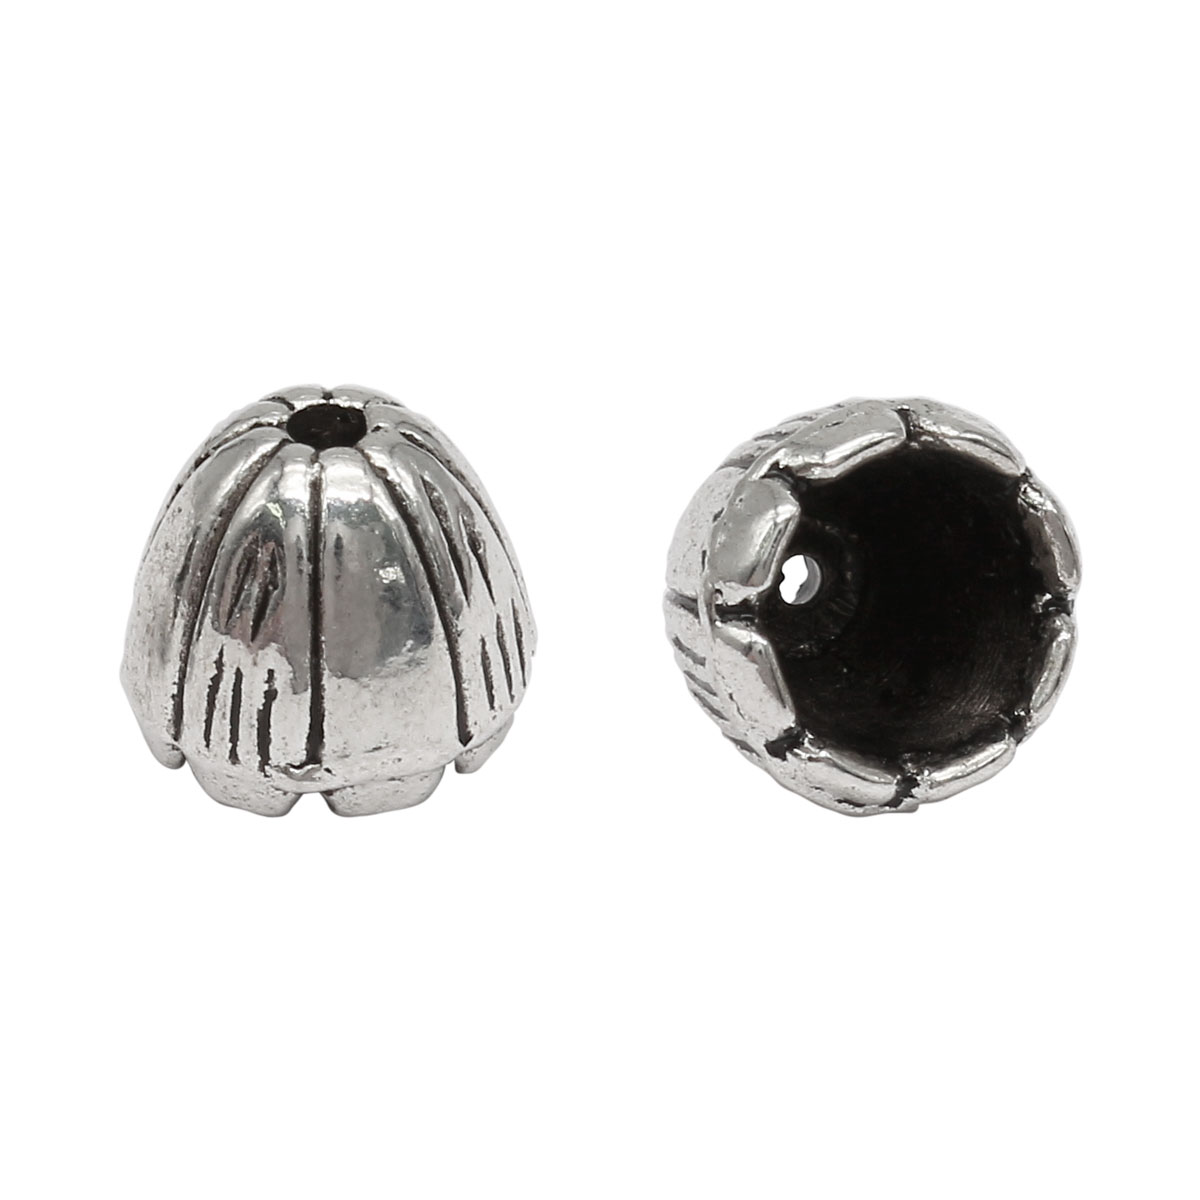 Шапочка для бусин 4AR269, 10мм, серебро, 10шт/упак, Астра